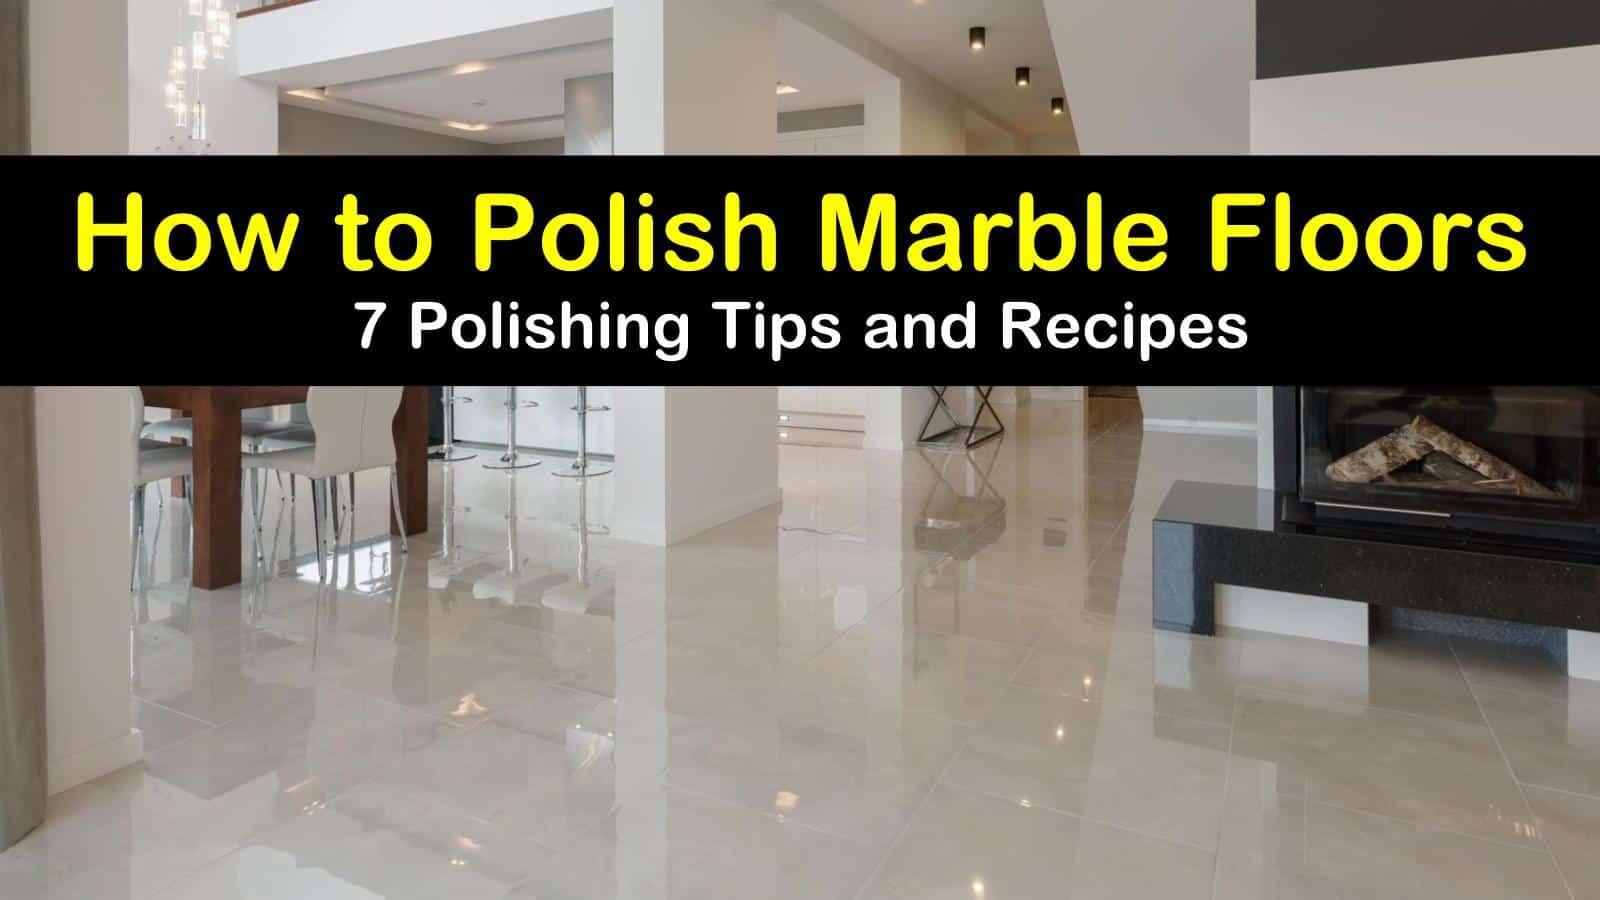 7 Easy Ways To Polish Marble Floors